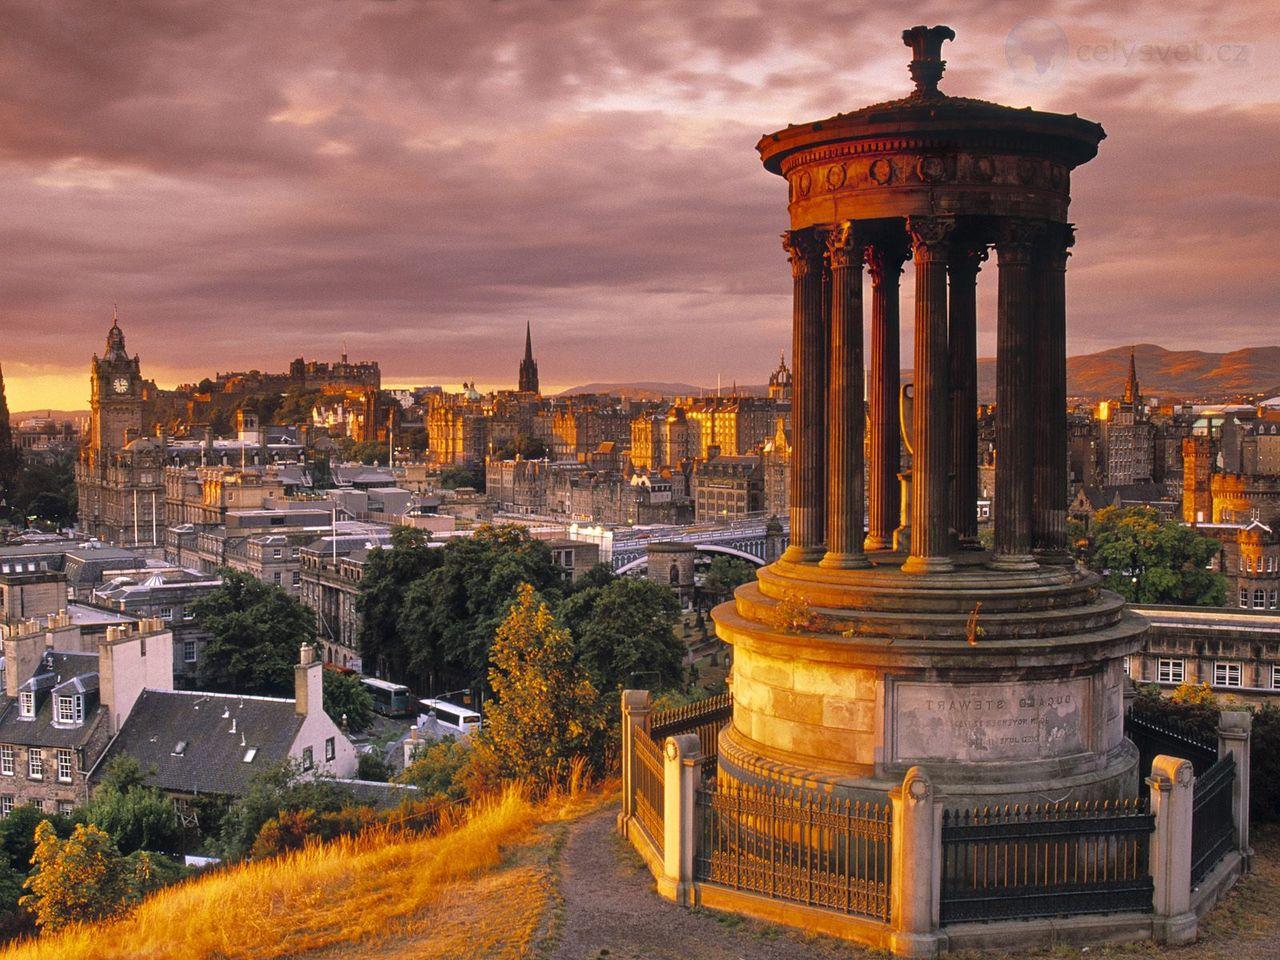 Обои dugald stewart monument, scotland, Шотландия, эдинбург, edinburgh, calton hill. Города foto 9